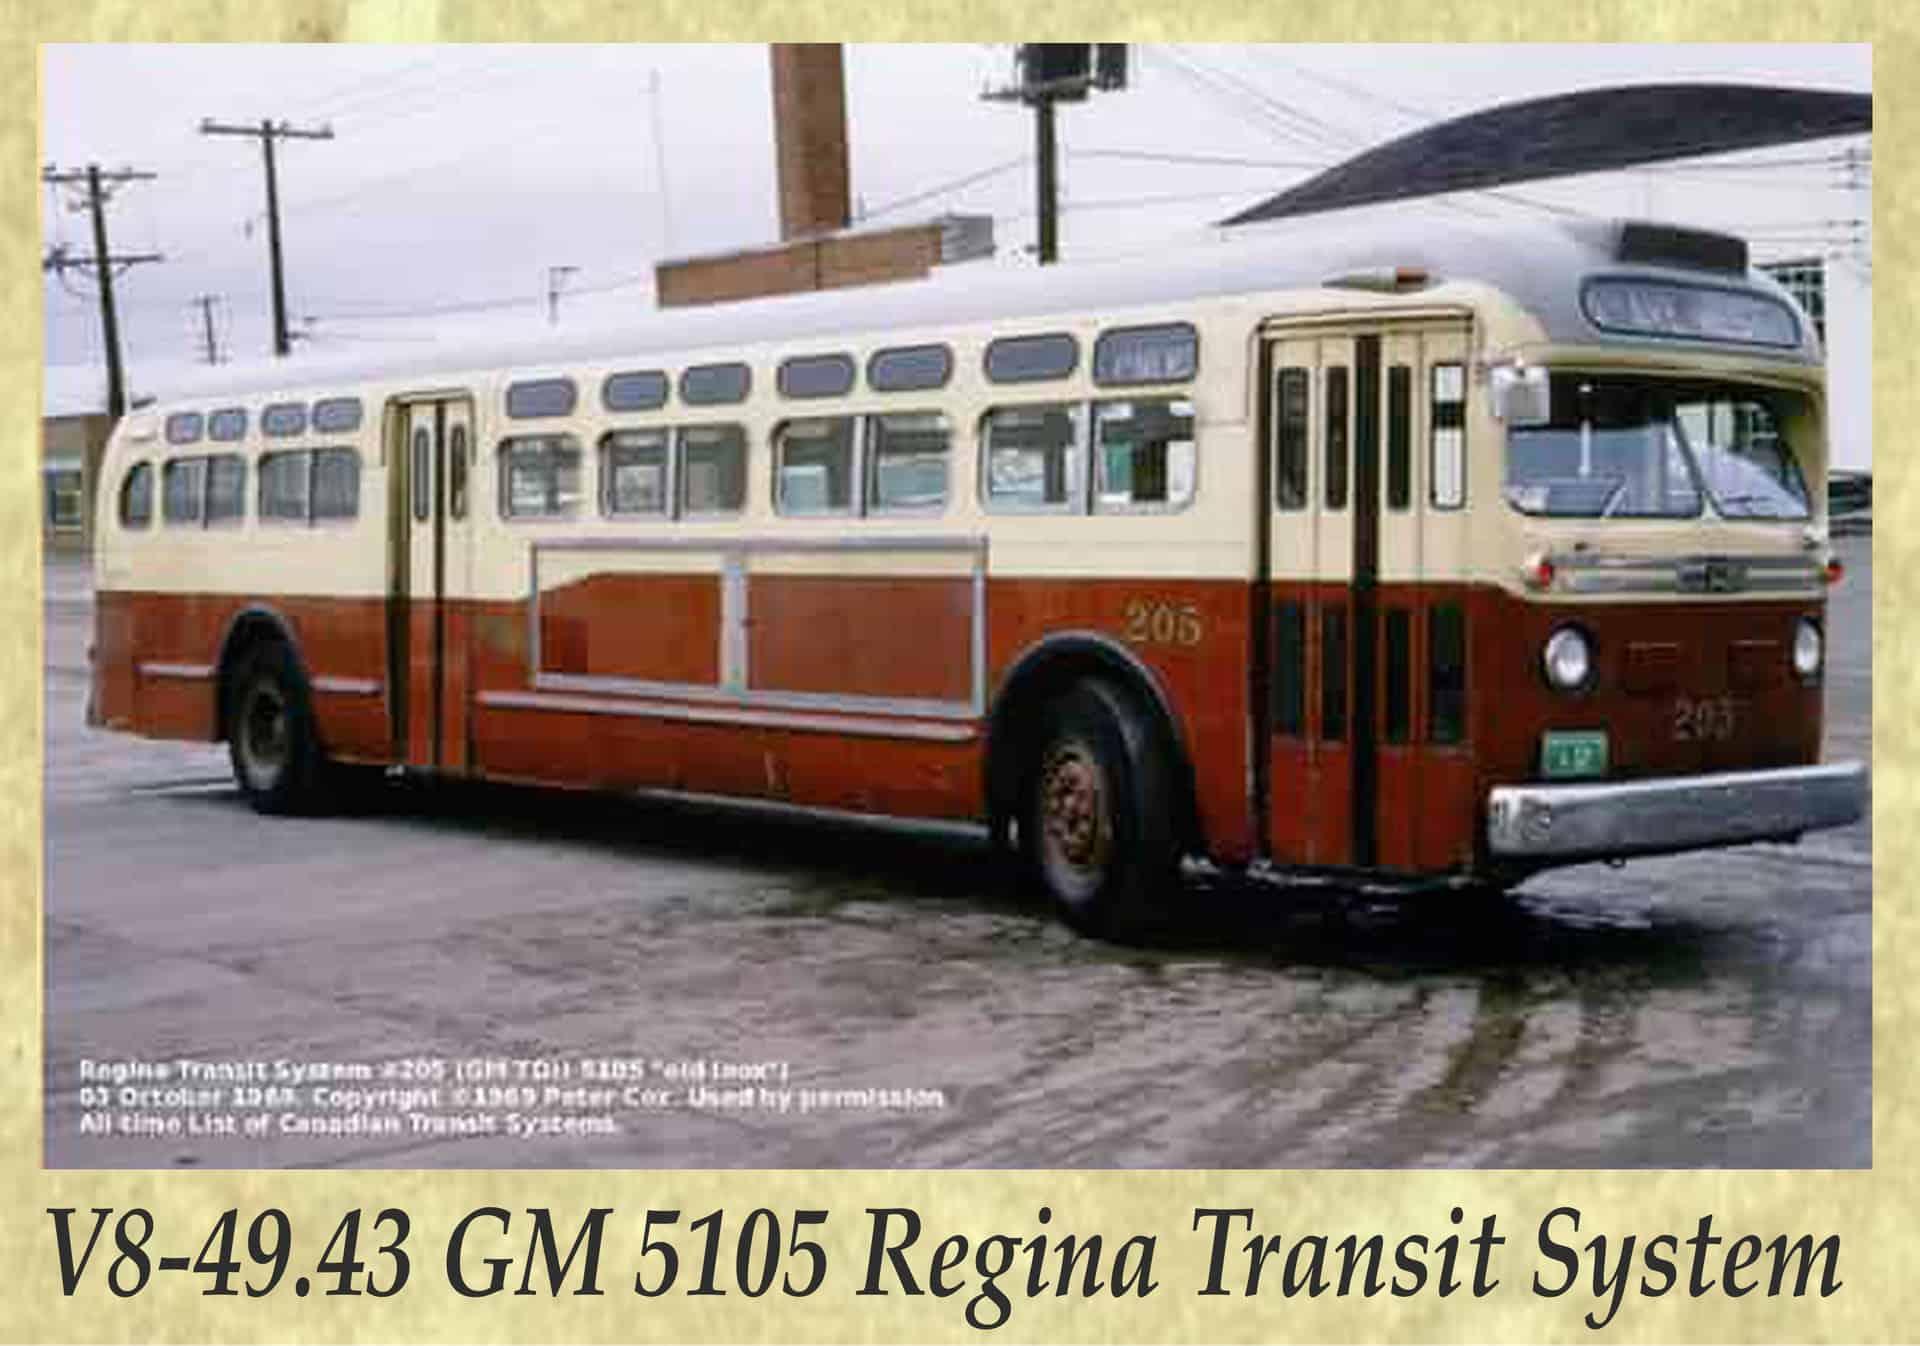 V8-49.43 GM 5105 Regina Transit System